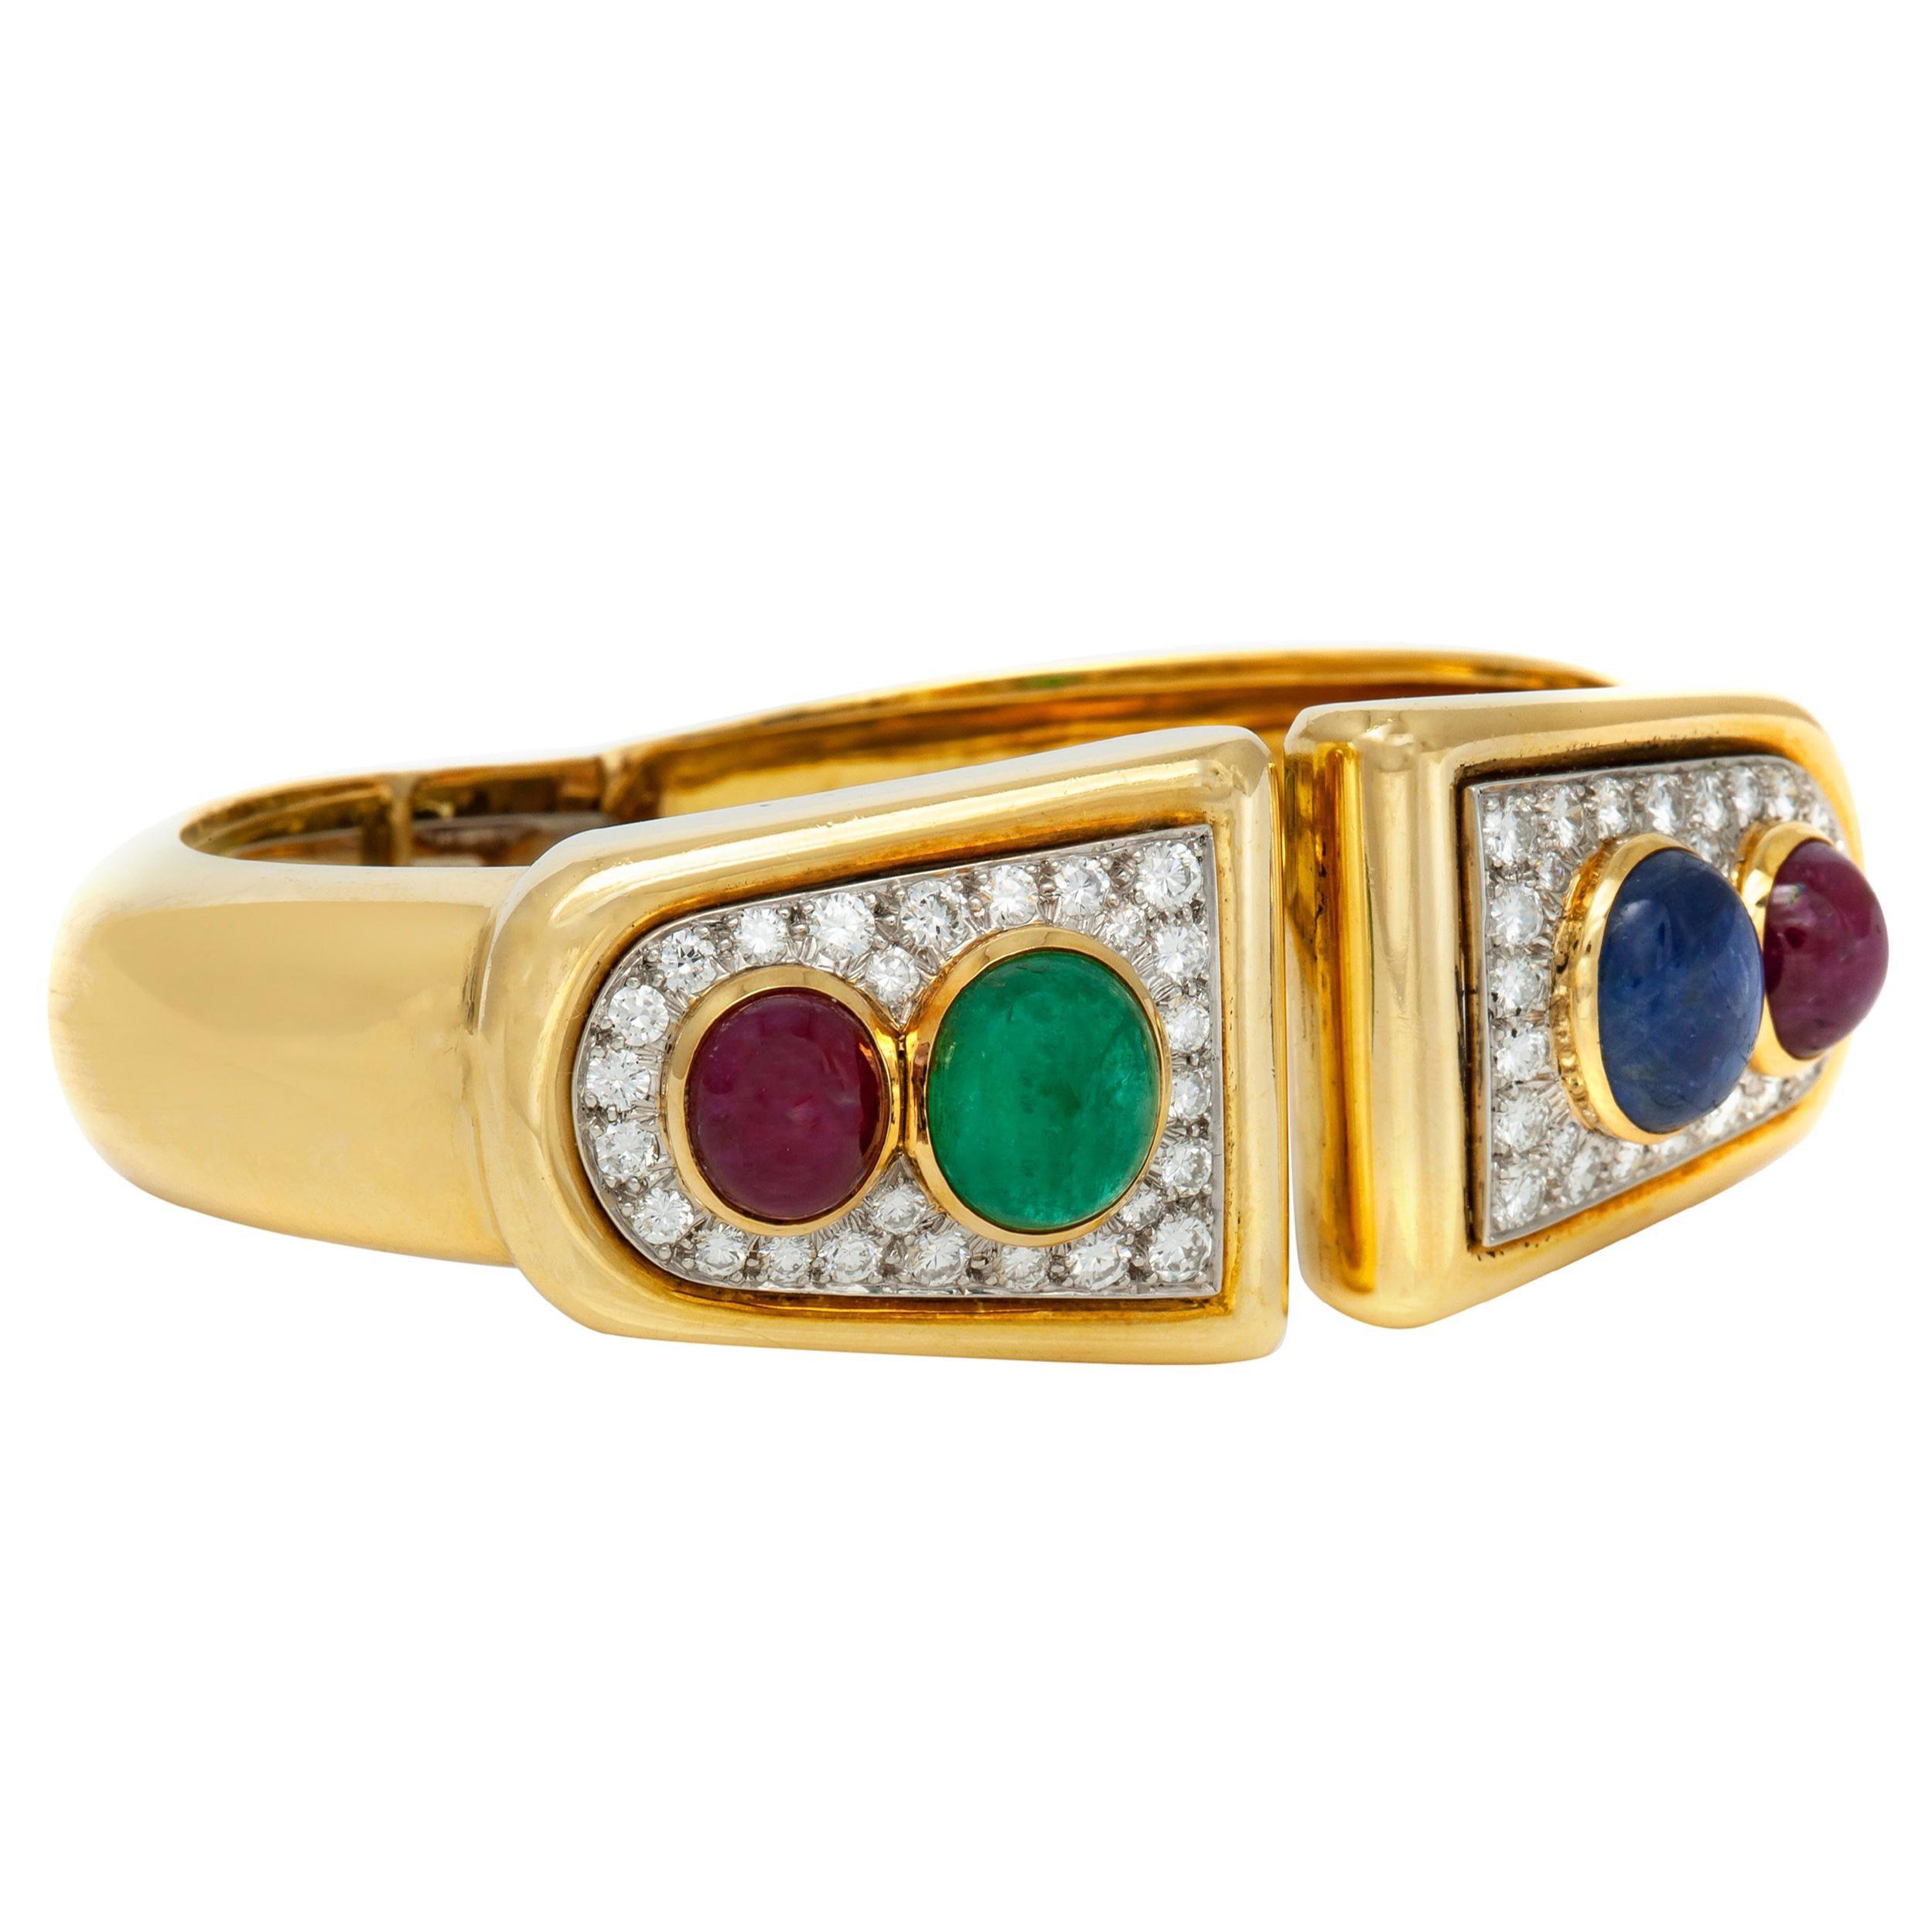 David Webb 18 Karat Diamond Ruby Sapphire Emerald Cuff Bracelet